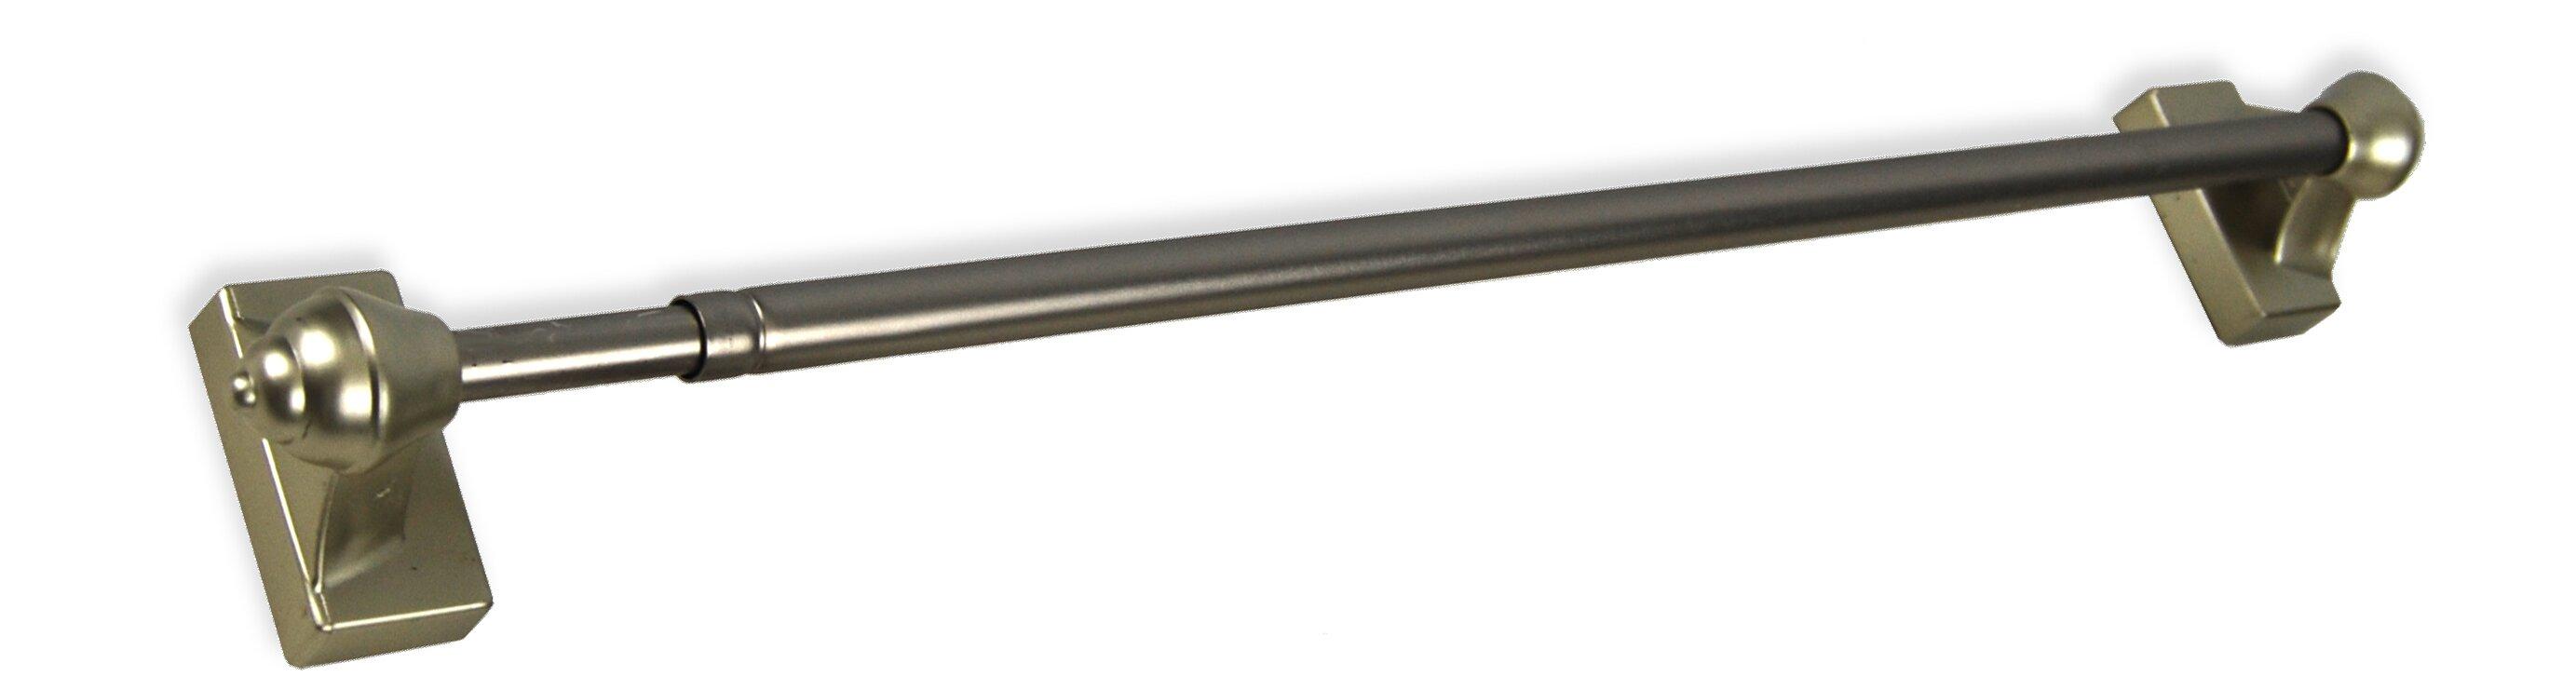 Magnetic Single Curtain Rod